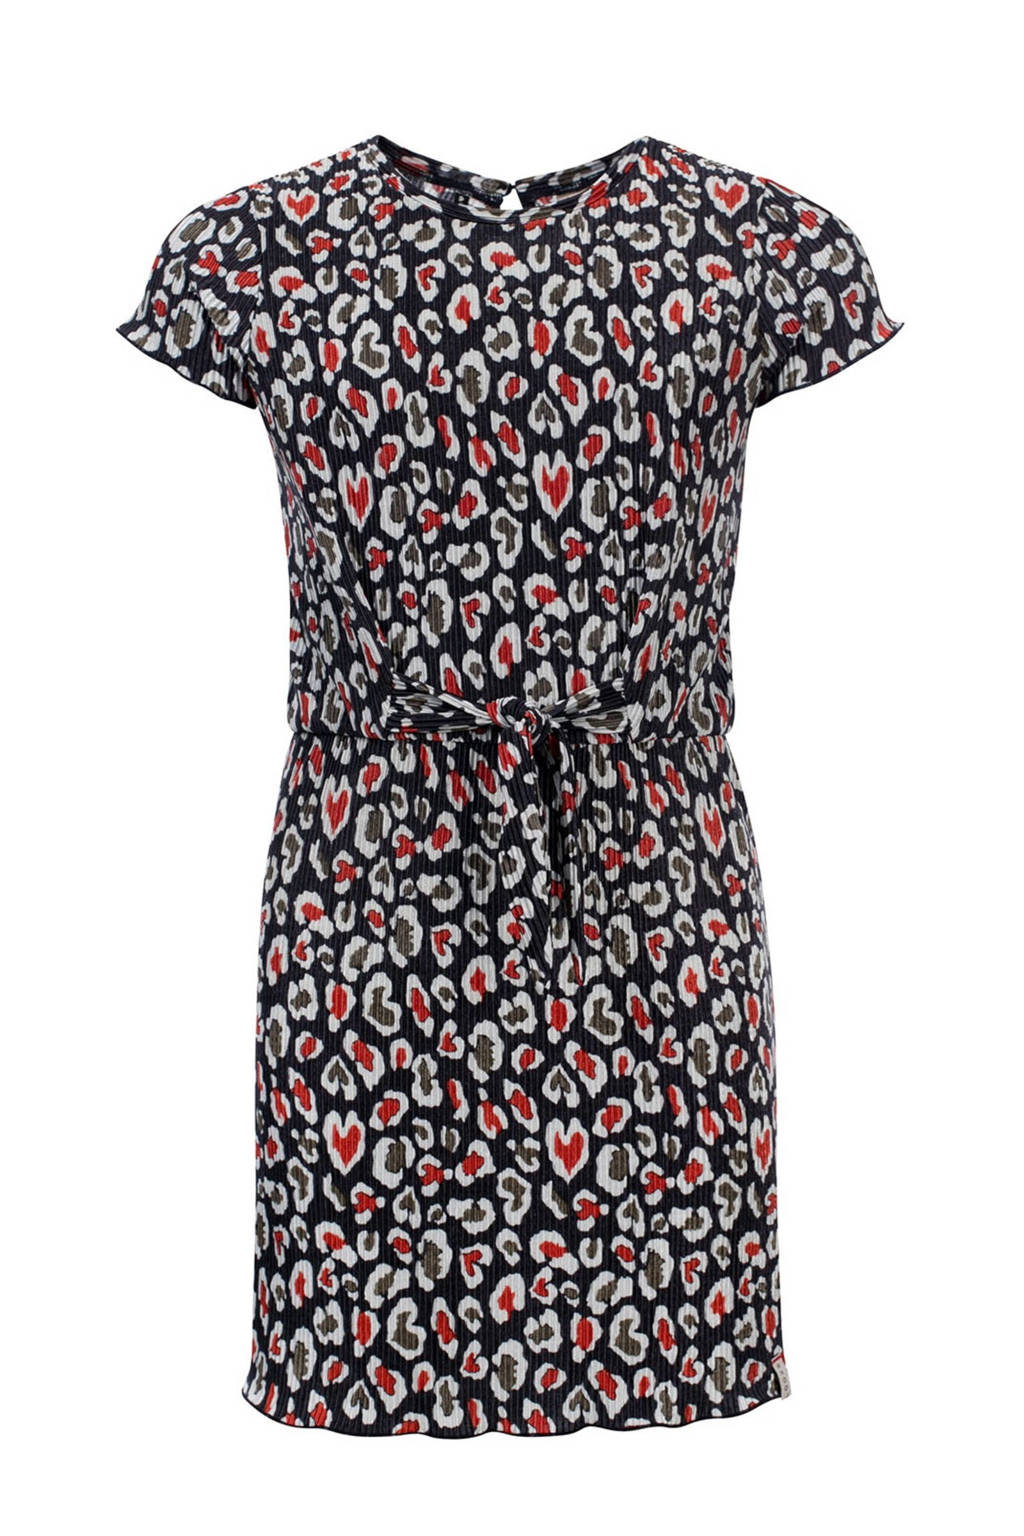 LOOXS 10sixteen jurk met all over print zwart/rood/wit, Zwart/rood/wit